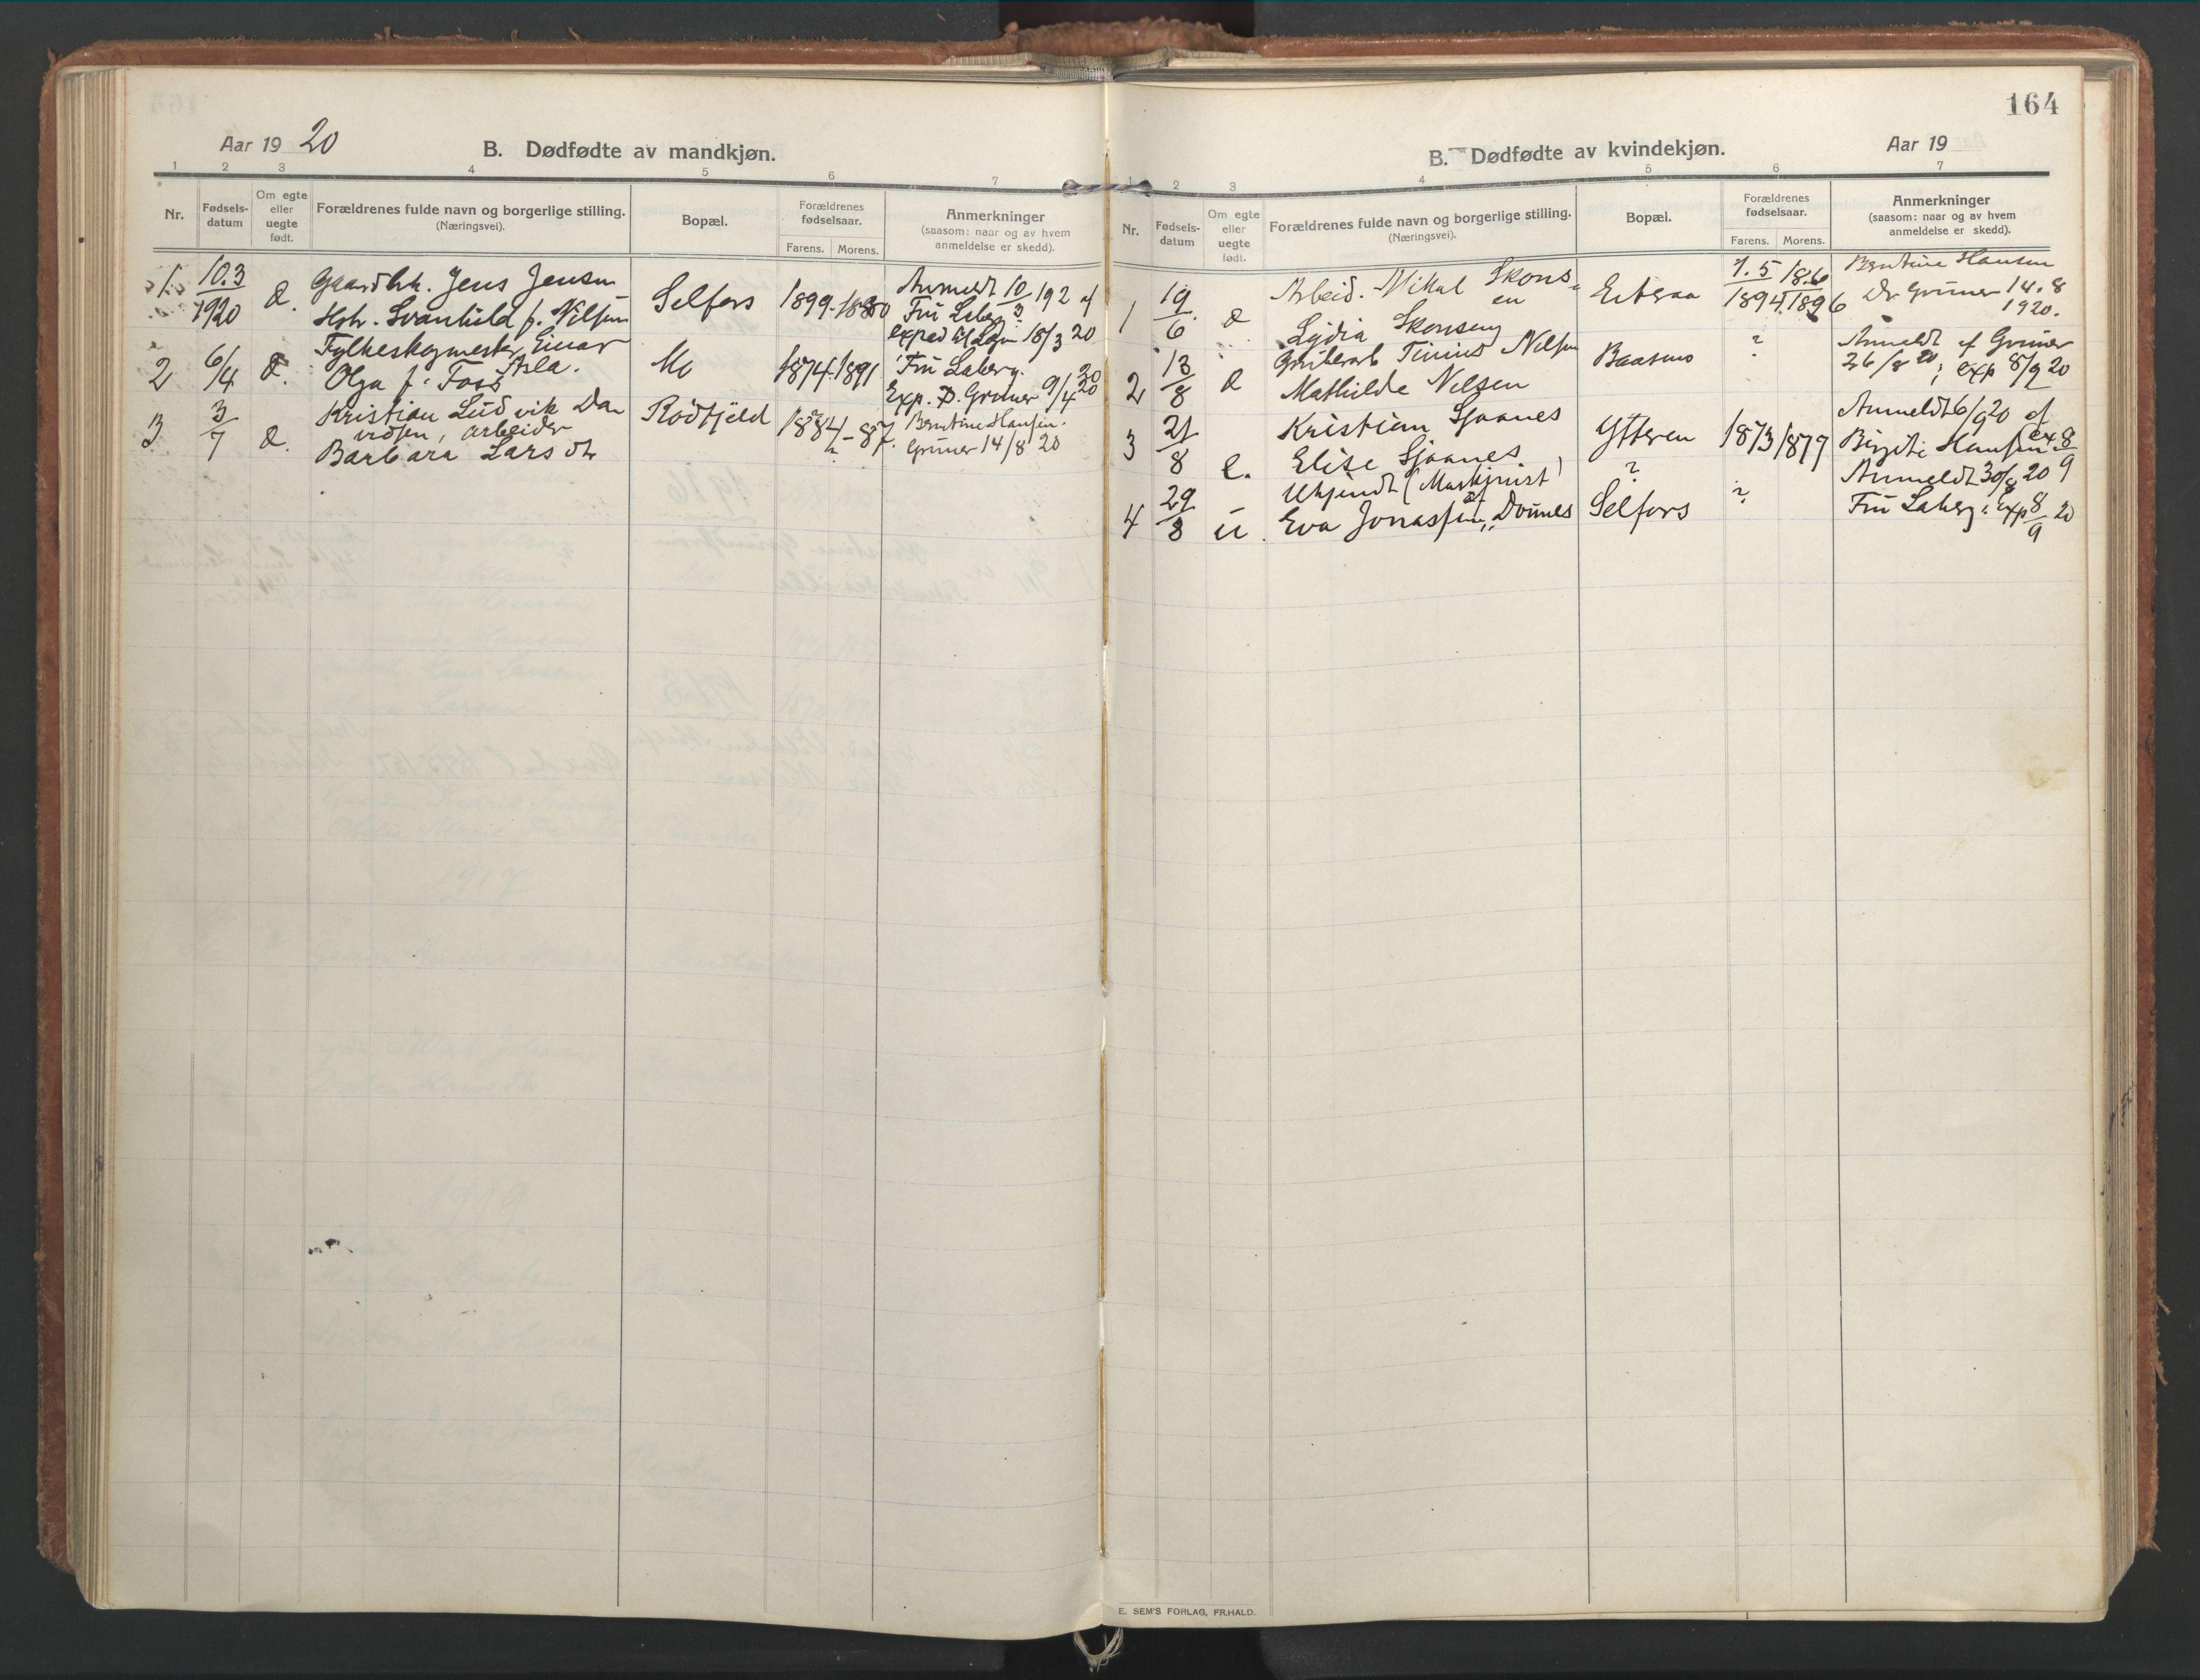 SAT, Ministerialprotokoller, klokkerbøker og fødselsregistre - Nordland, 827/L0404: Ministerialbok nr. 827A16, 1912-1925, s. 164